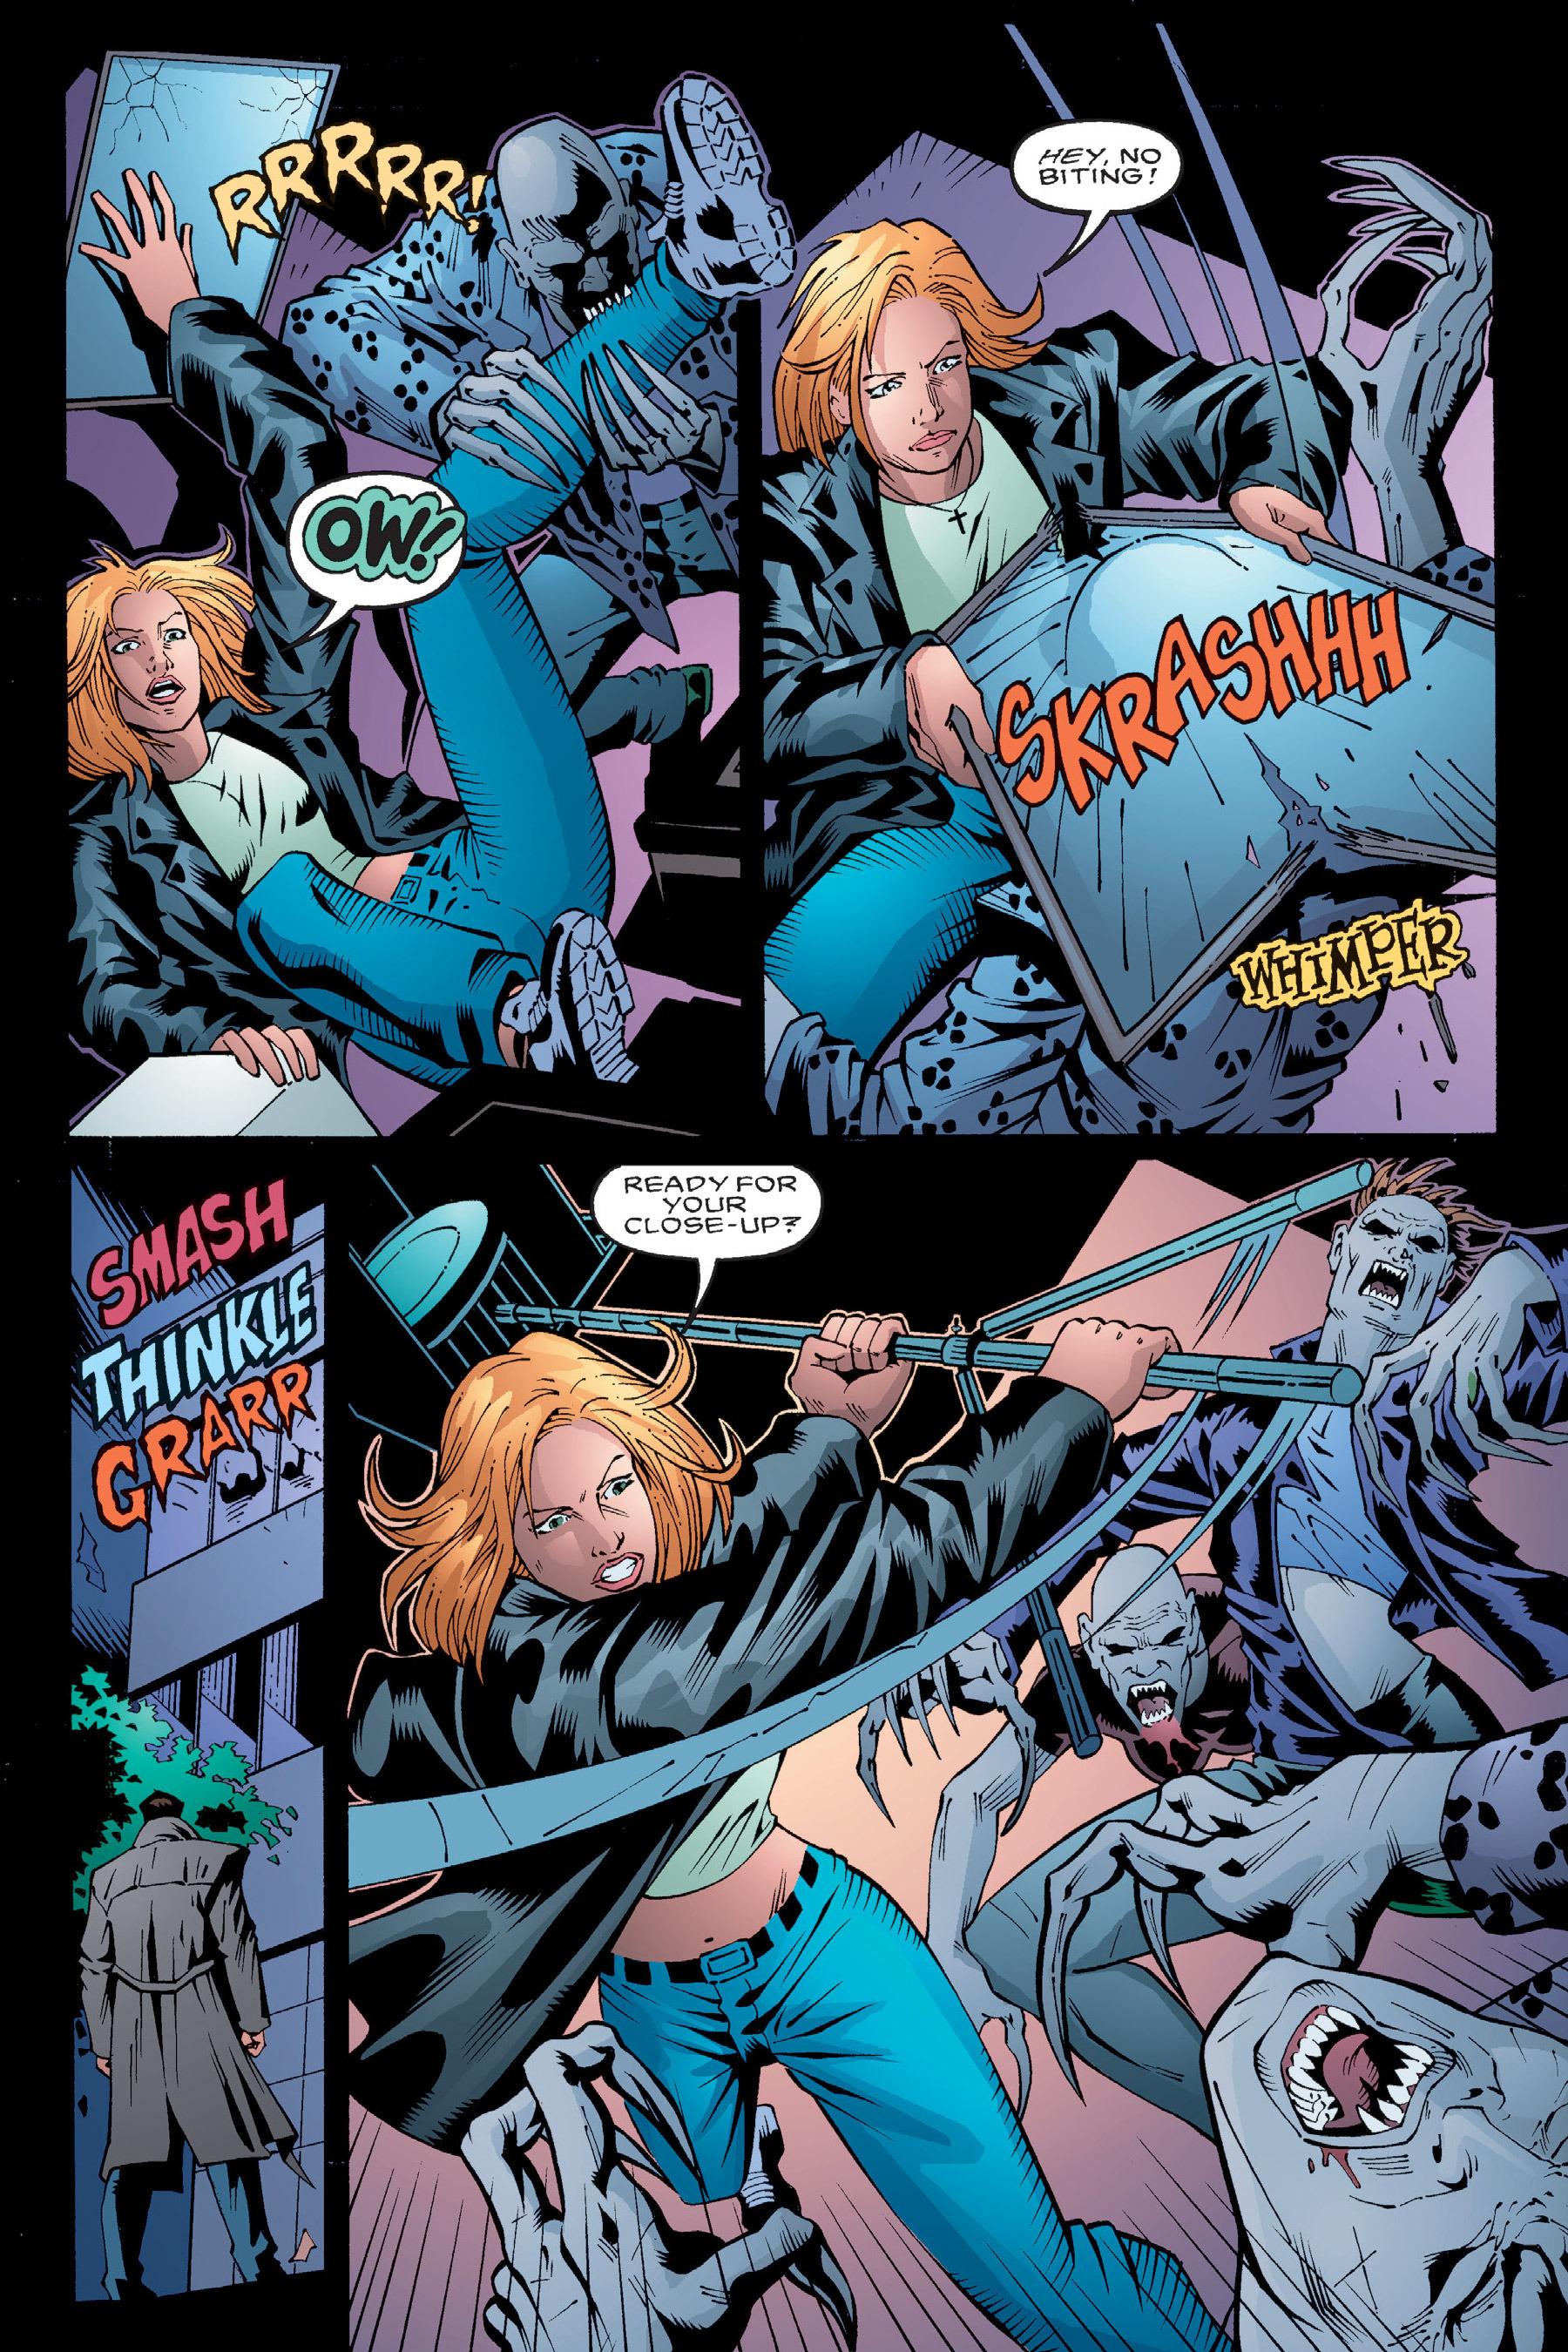 Read online Buffy the Vampire Slayer: Omnibus comic -  Issue # TPB 4 - 49